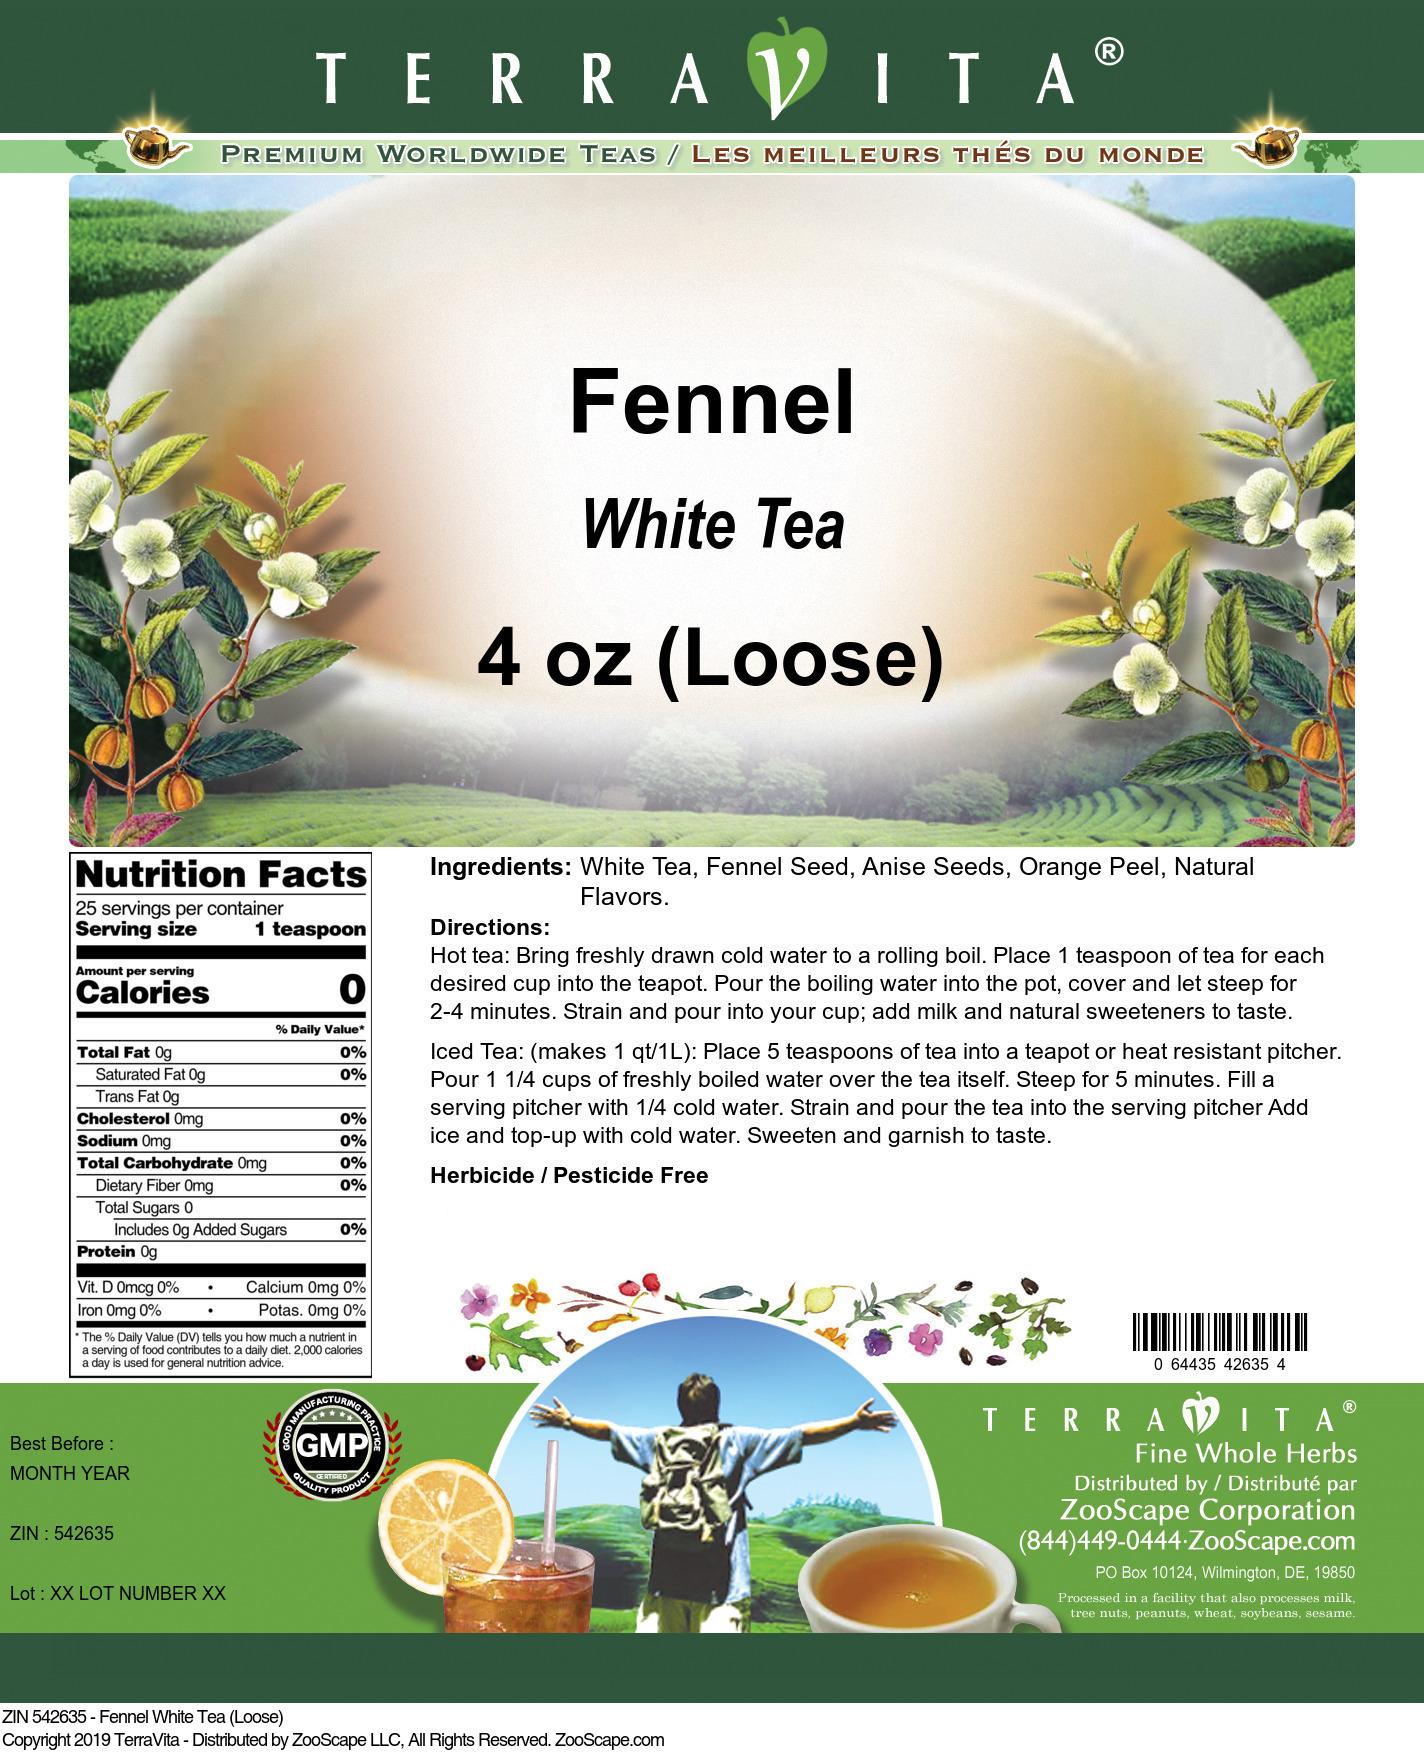 Fennel White Tea